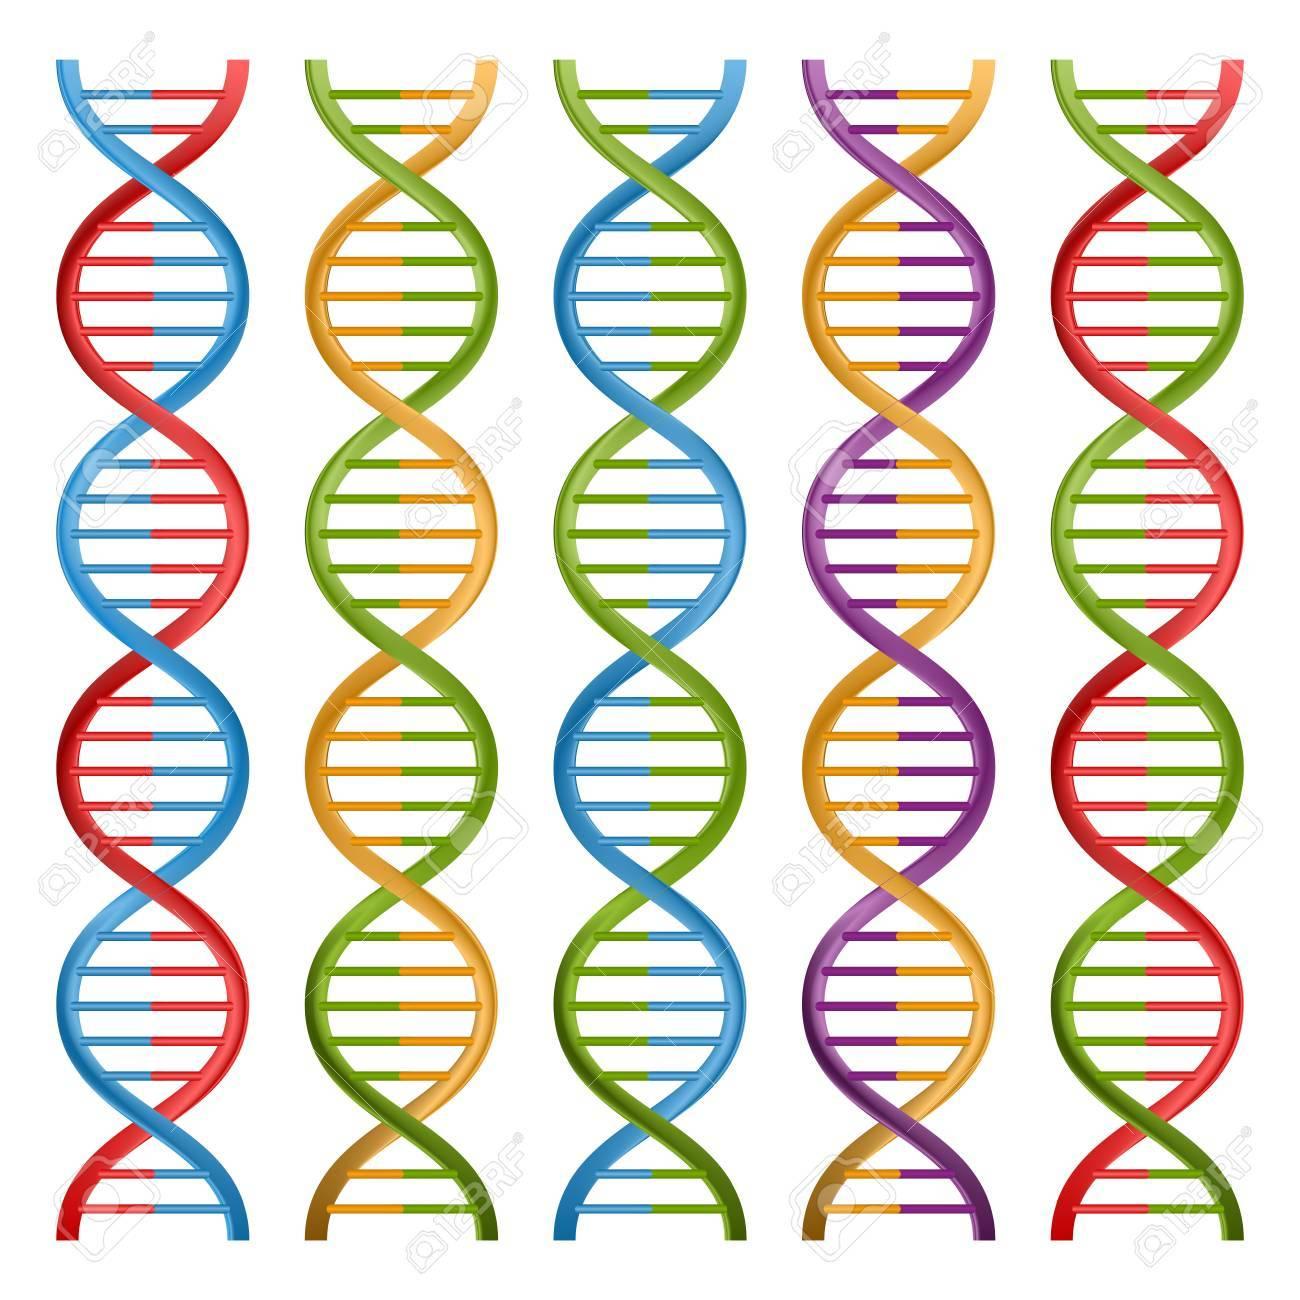 Set Of Dna Symbols For Science And Medicine Vector Design Royalty